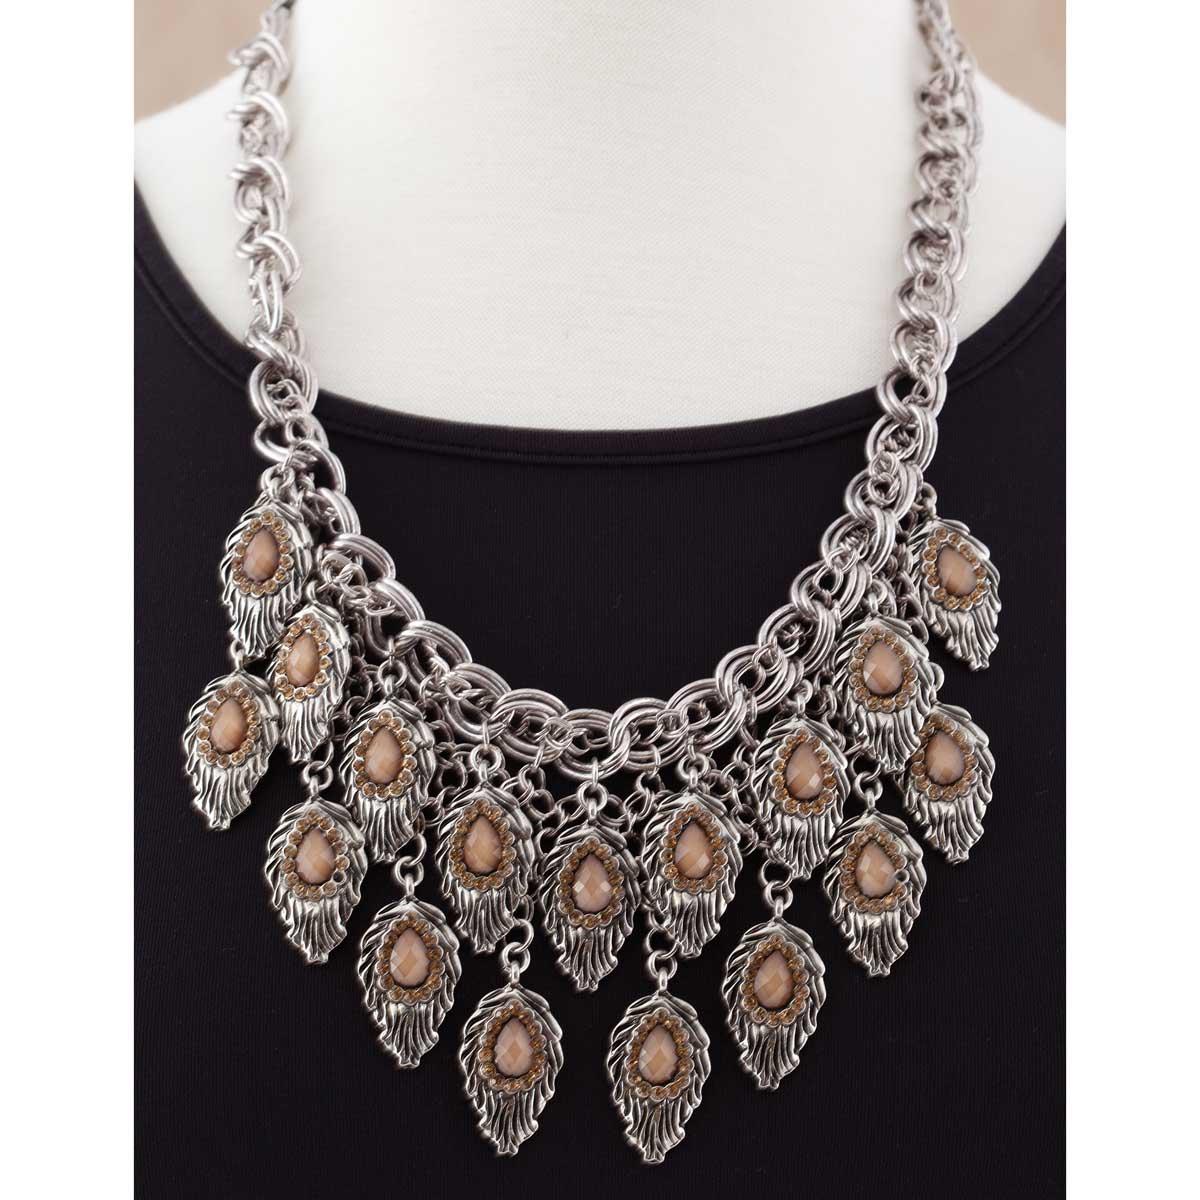 Antique Silver Multi Leaf Necklace *30sp